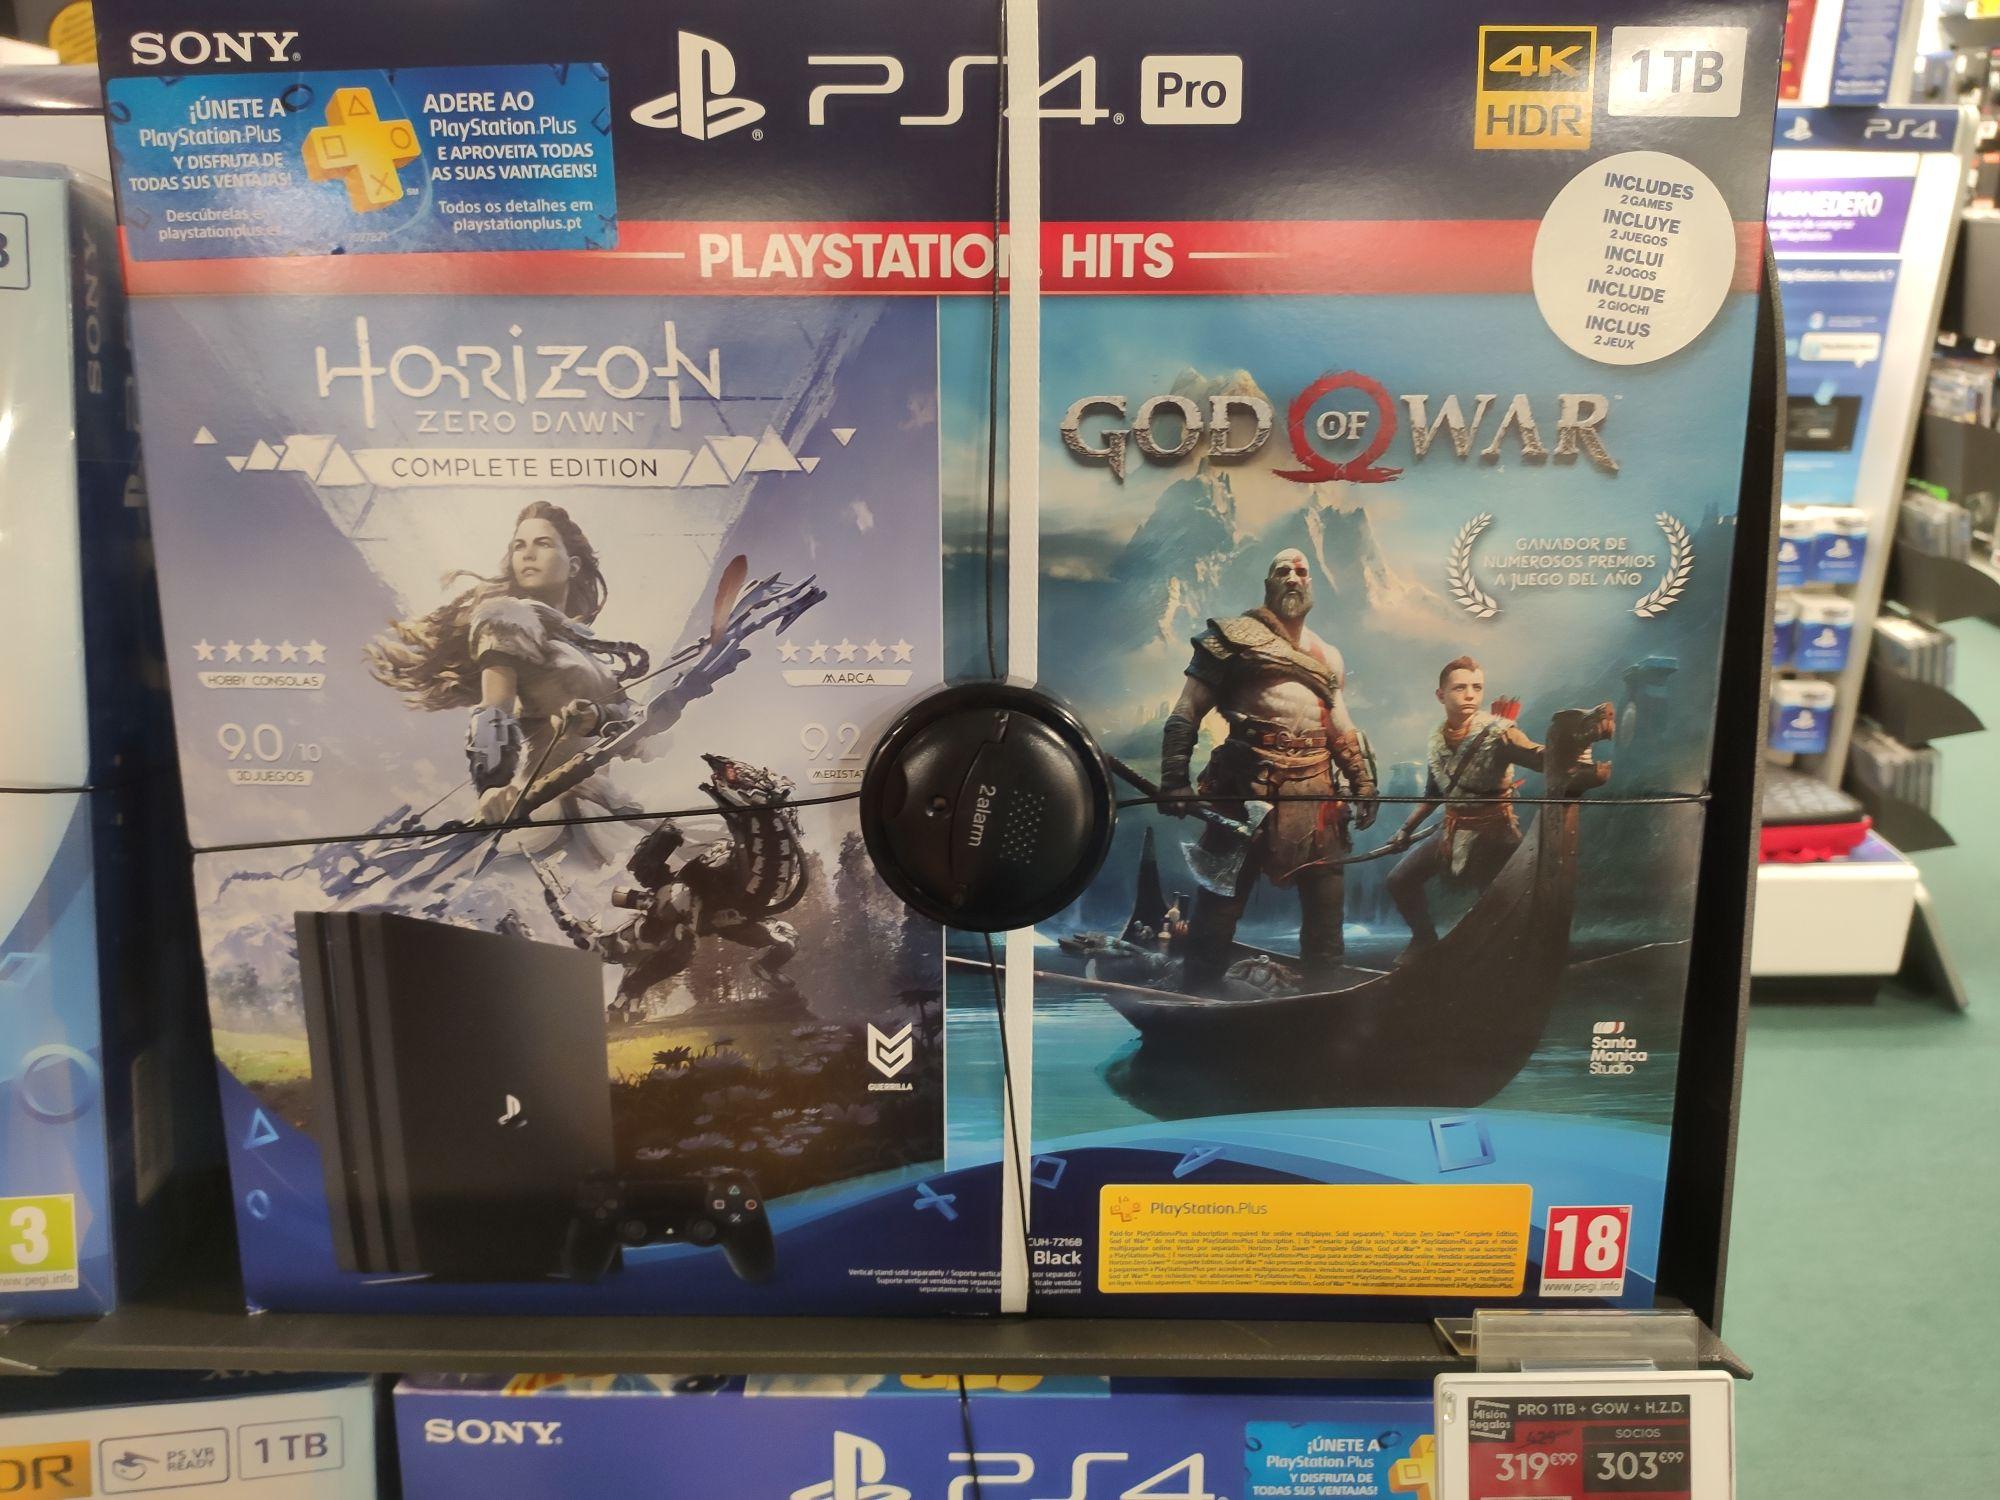 Ps4 Pro + god of war + Horizon zero down + PS hits a 5€